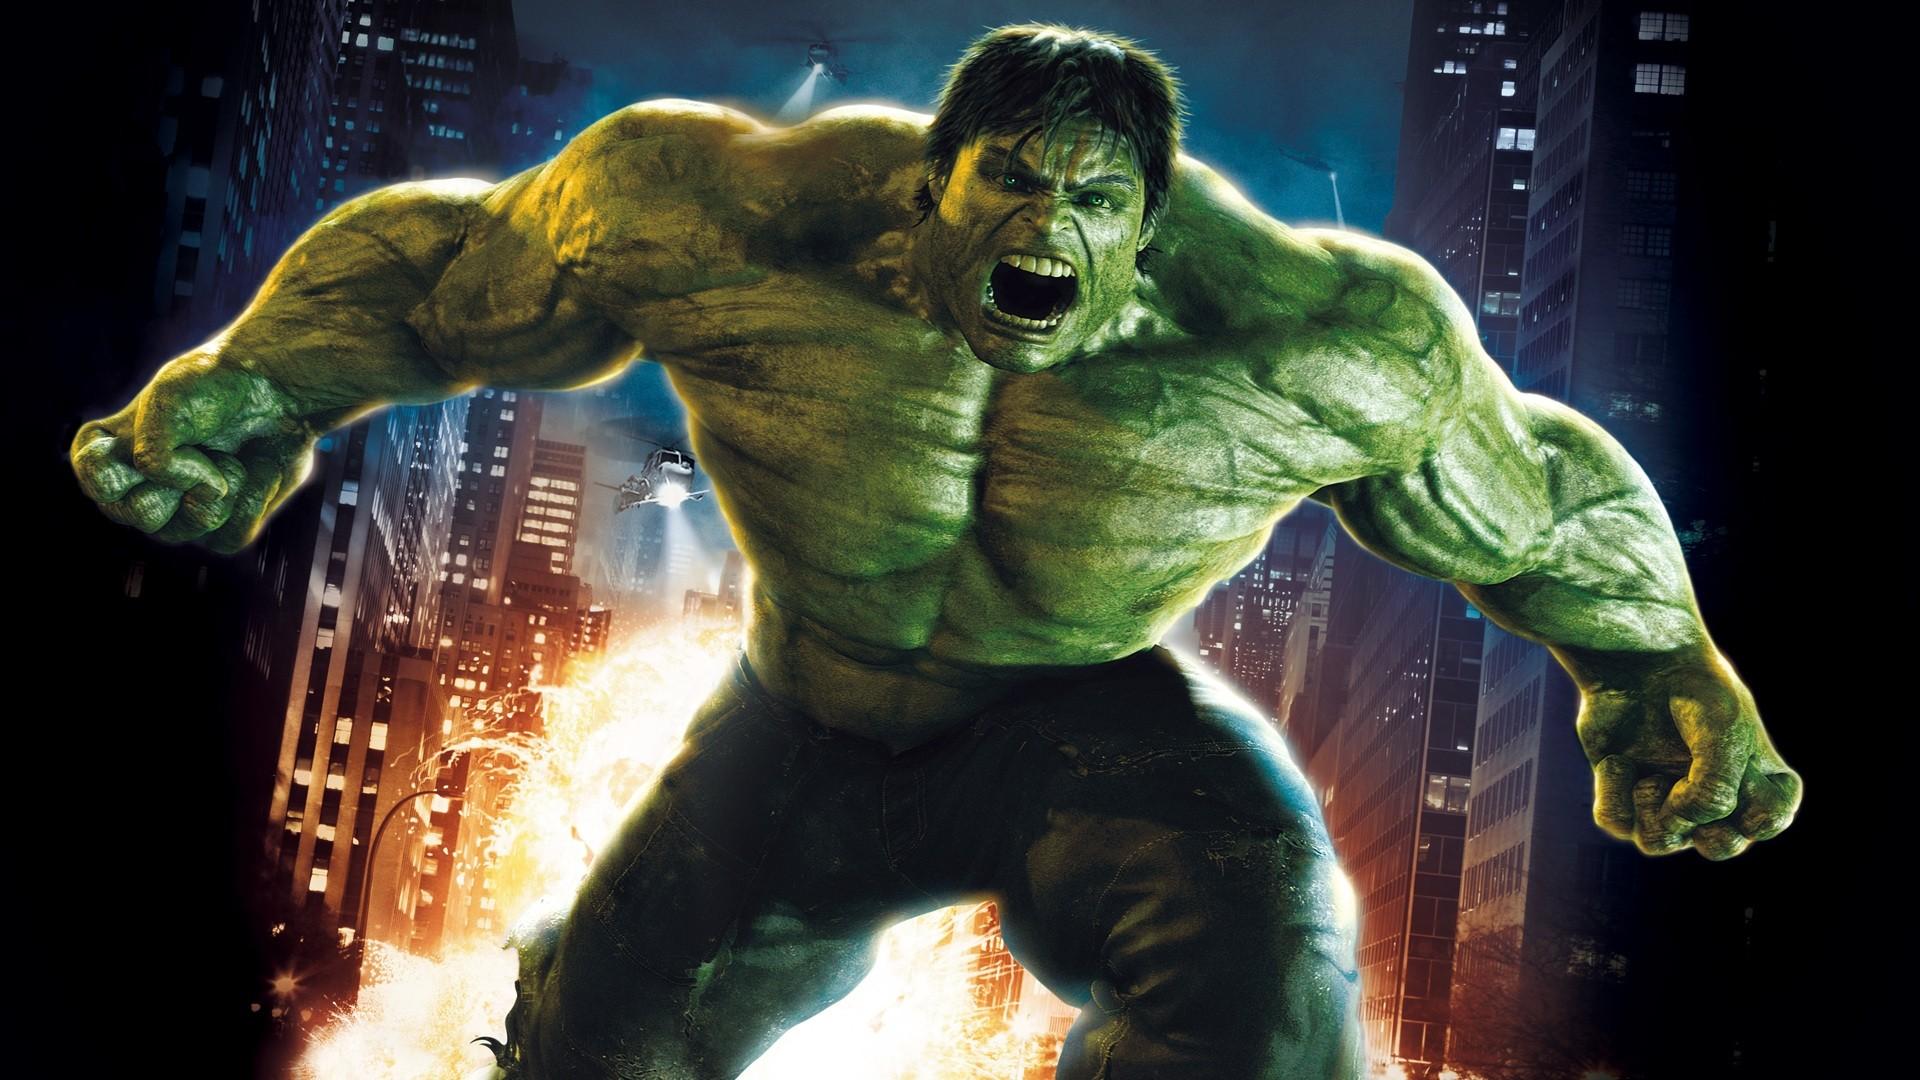 Must see Wallpaper Mobile Hulk - 70599-hulk-wallpaper-1920x1080-for-windows-10  Gallery_944647.jpg